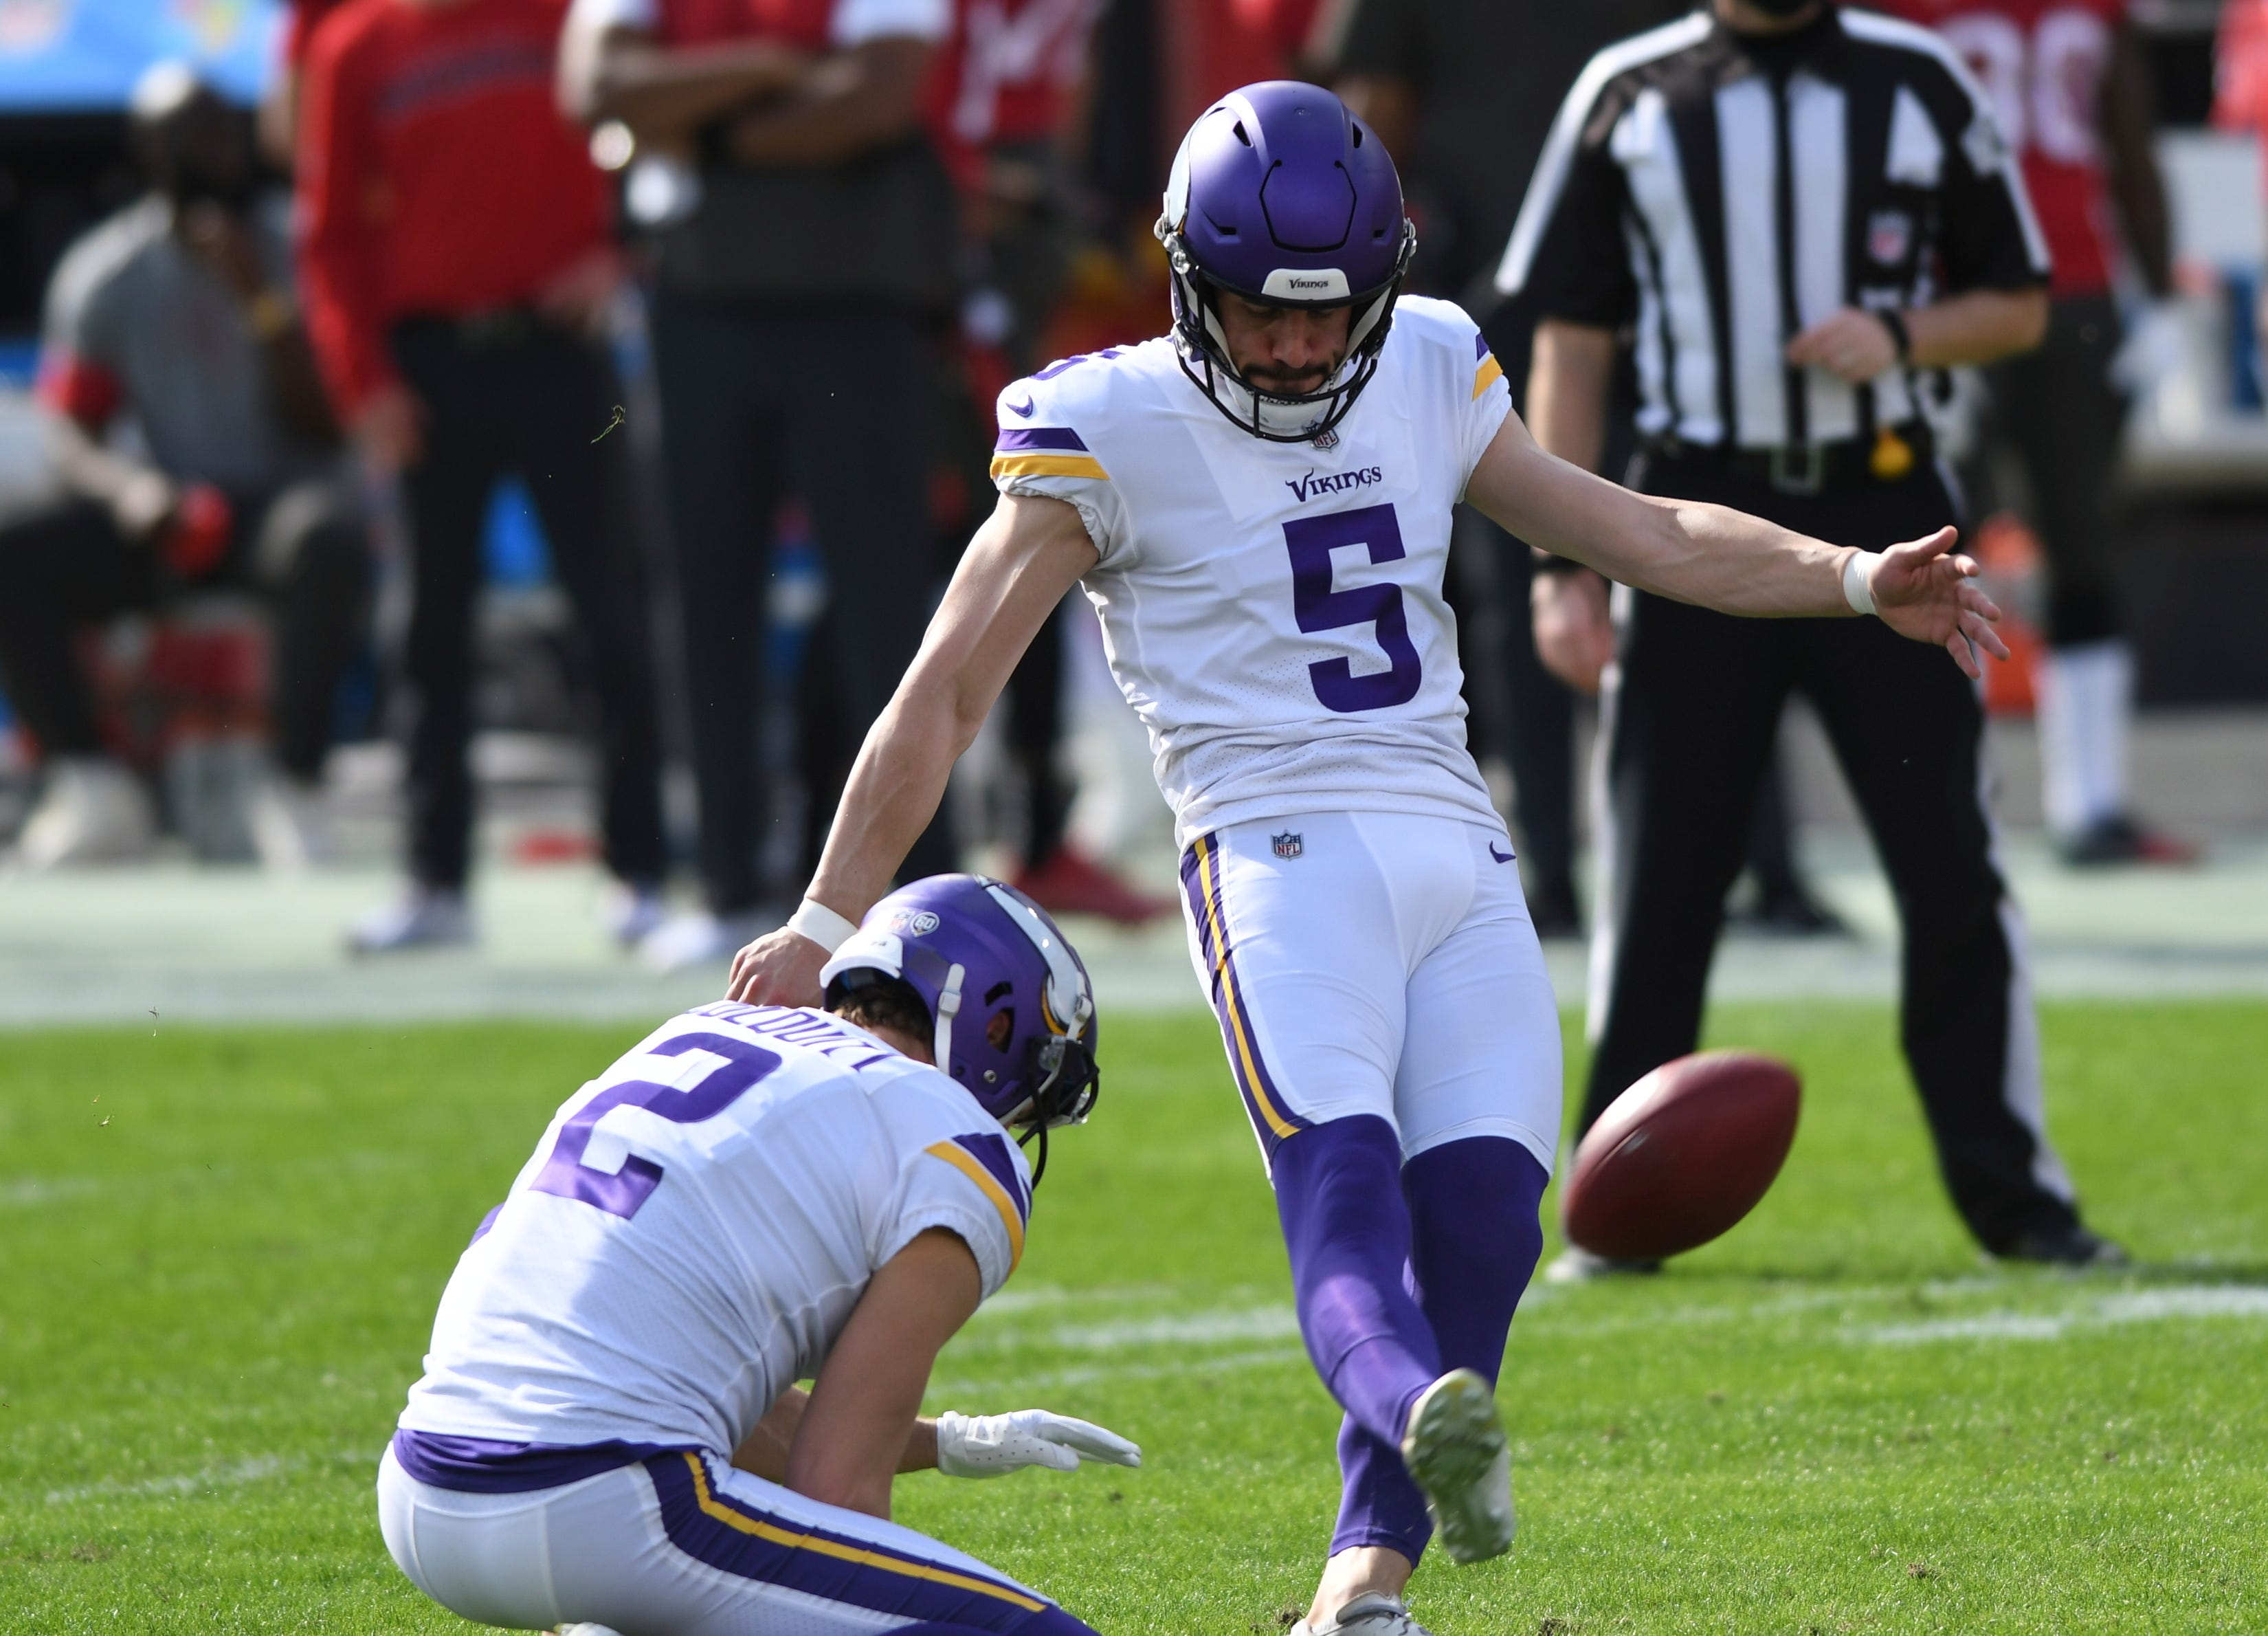 Minnesota Vikings place kicker Dan Bailey misses four kicks in loss against Buccaneers